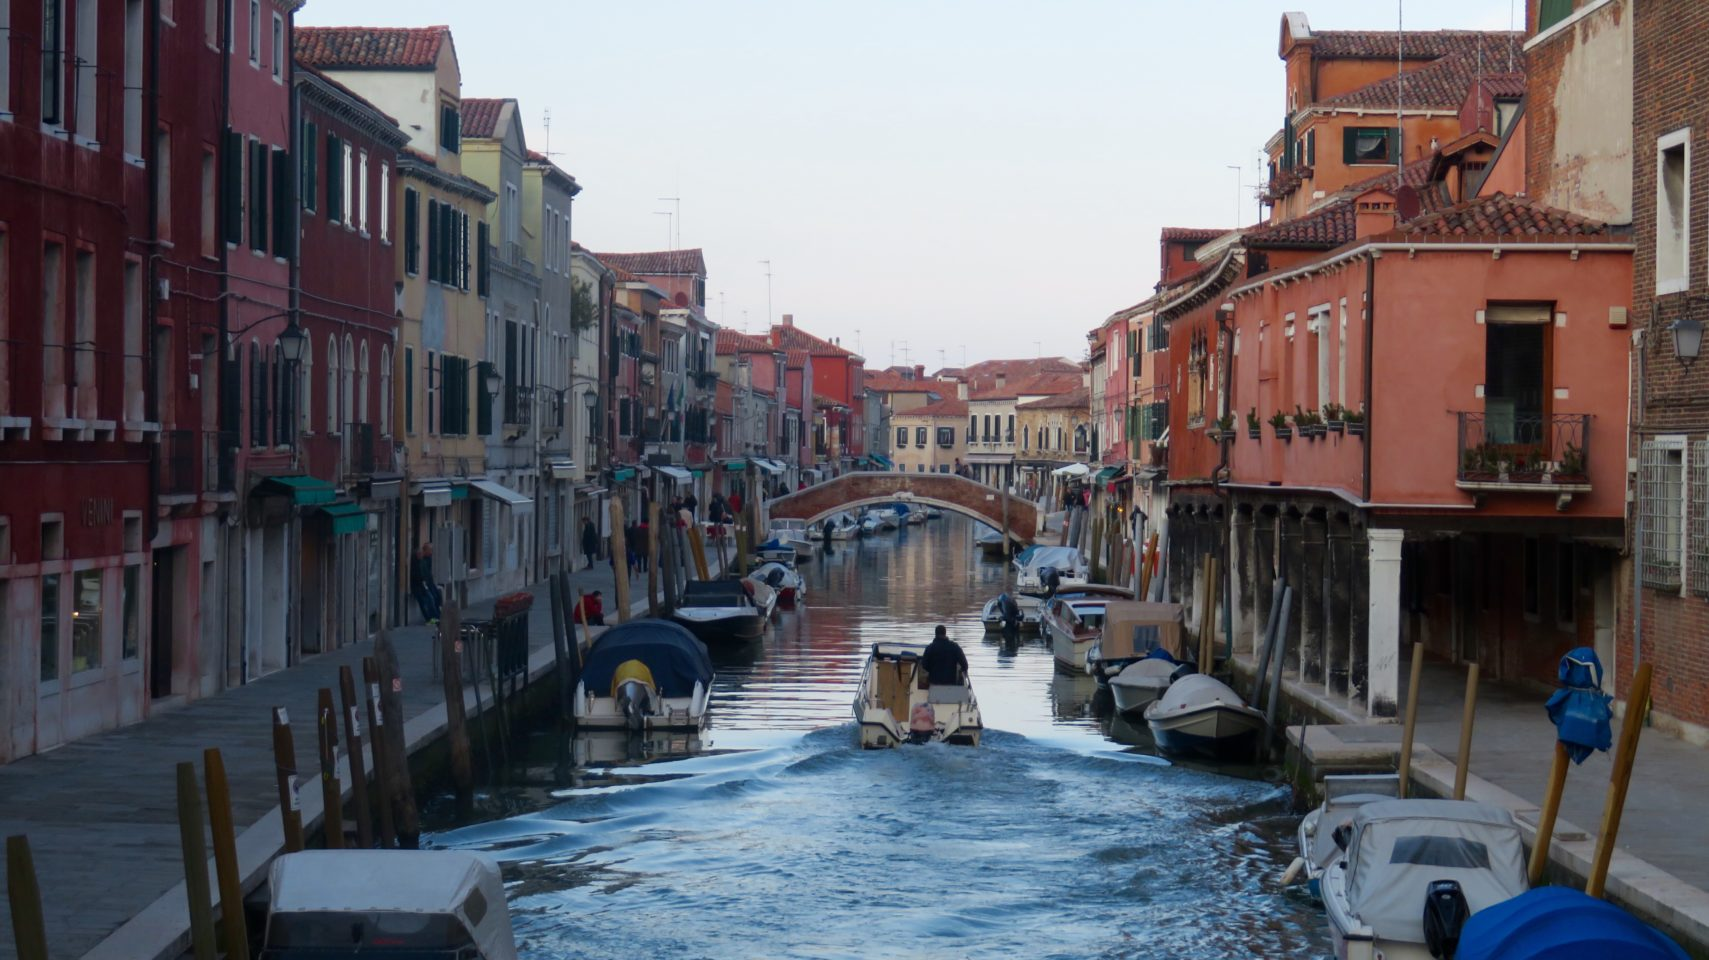 VIKING OCEAN CRUISES ~ Murano in Venice, Italy